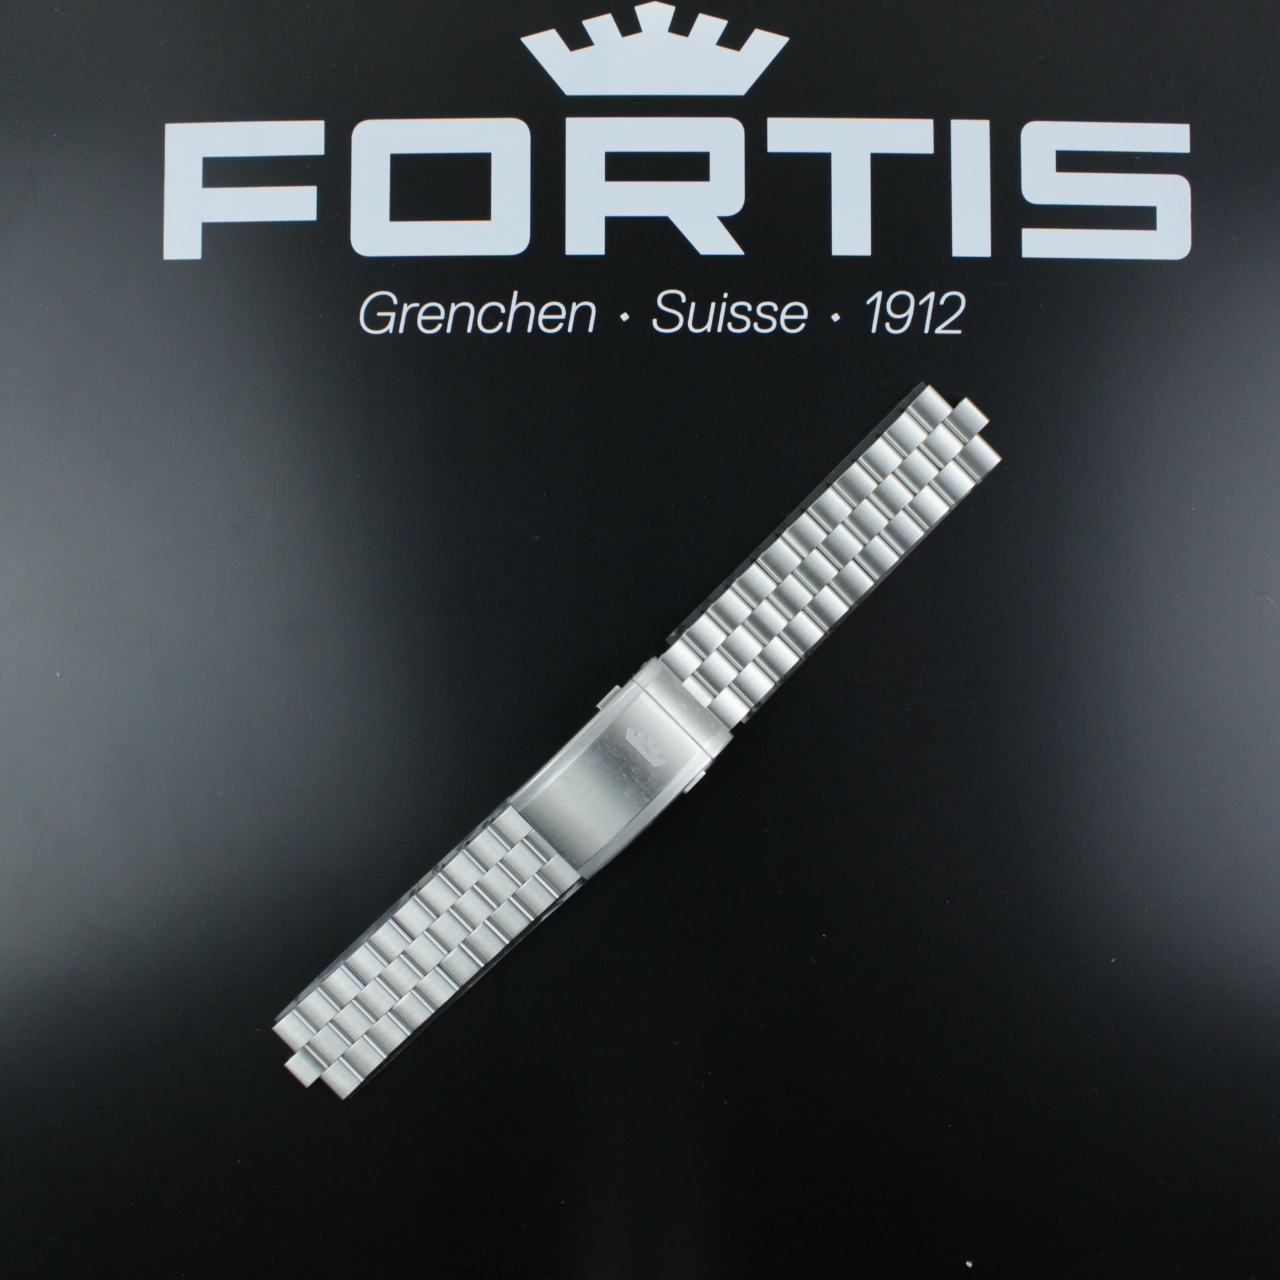 Fortis Flieger F-41 Metallband 21/20, Edelstahl gebürstet